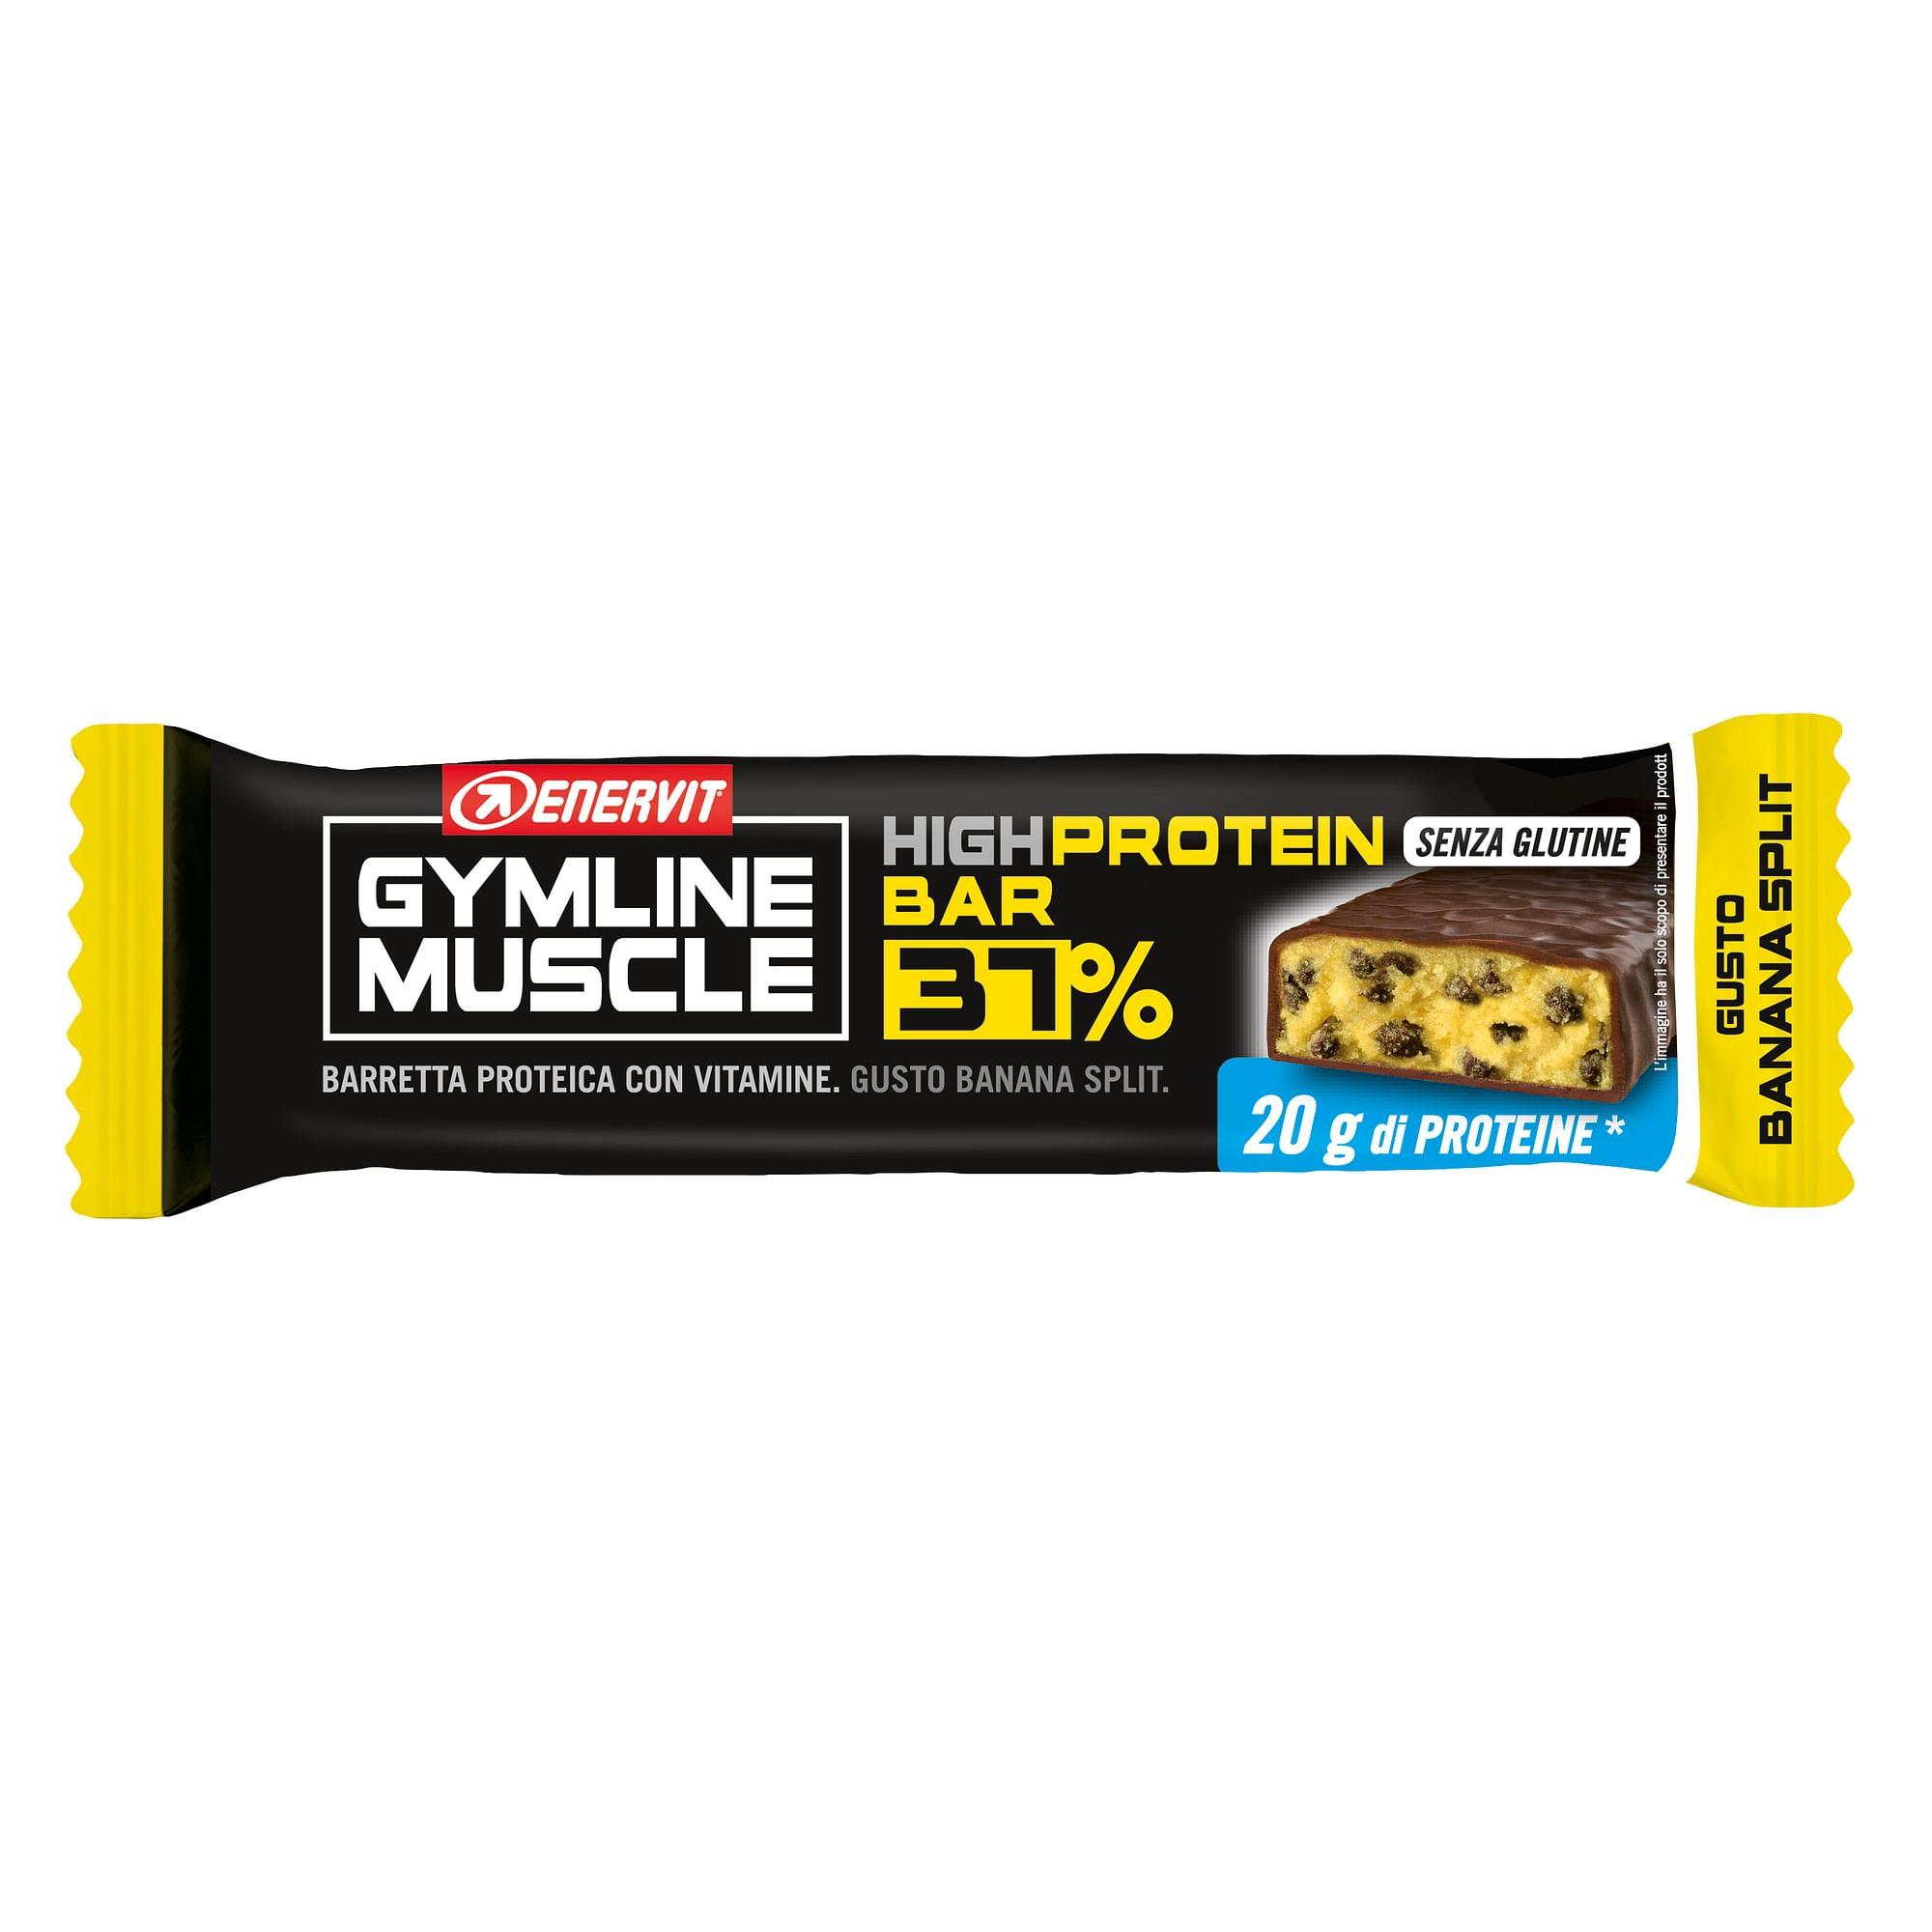 enervit gymline muscle high protein bar 37% banana split 54 g